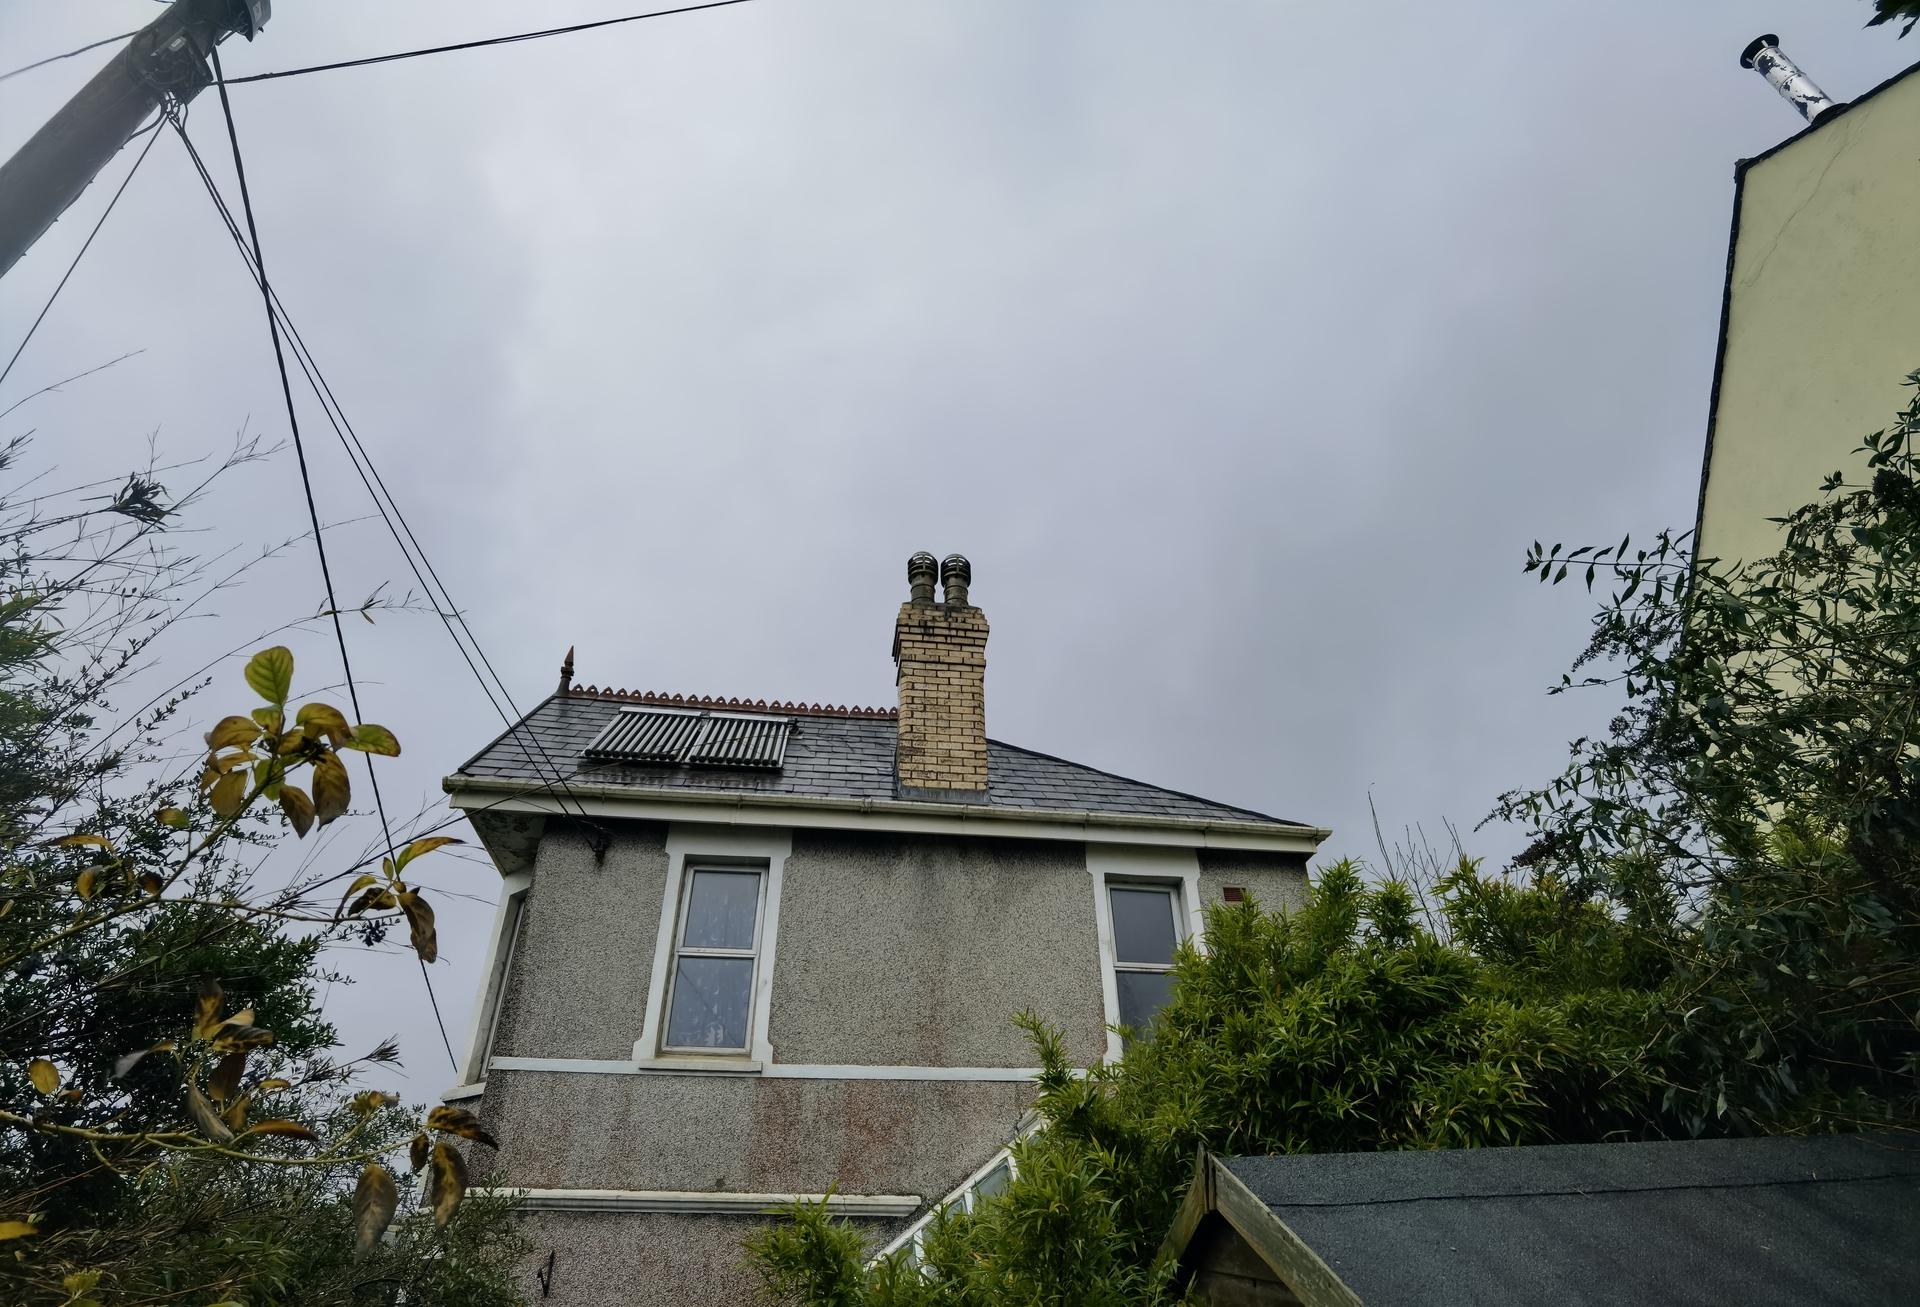 Huawei Mate 40 Pro ultrawide photo sample of a chimney